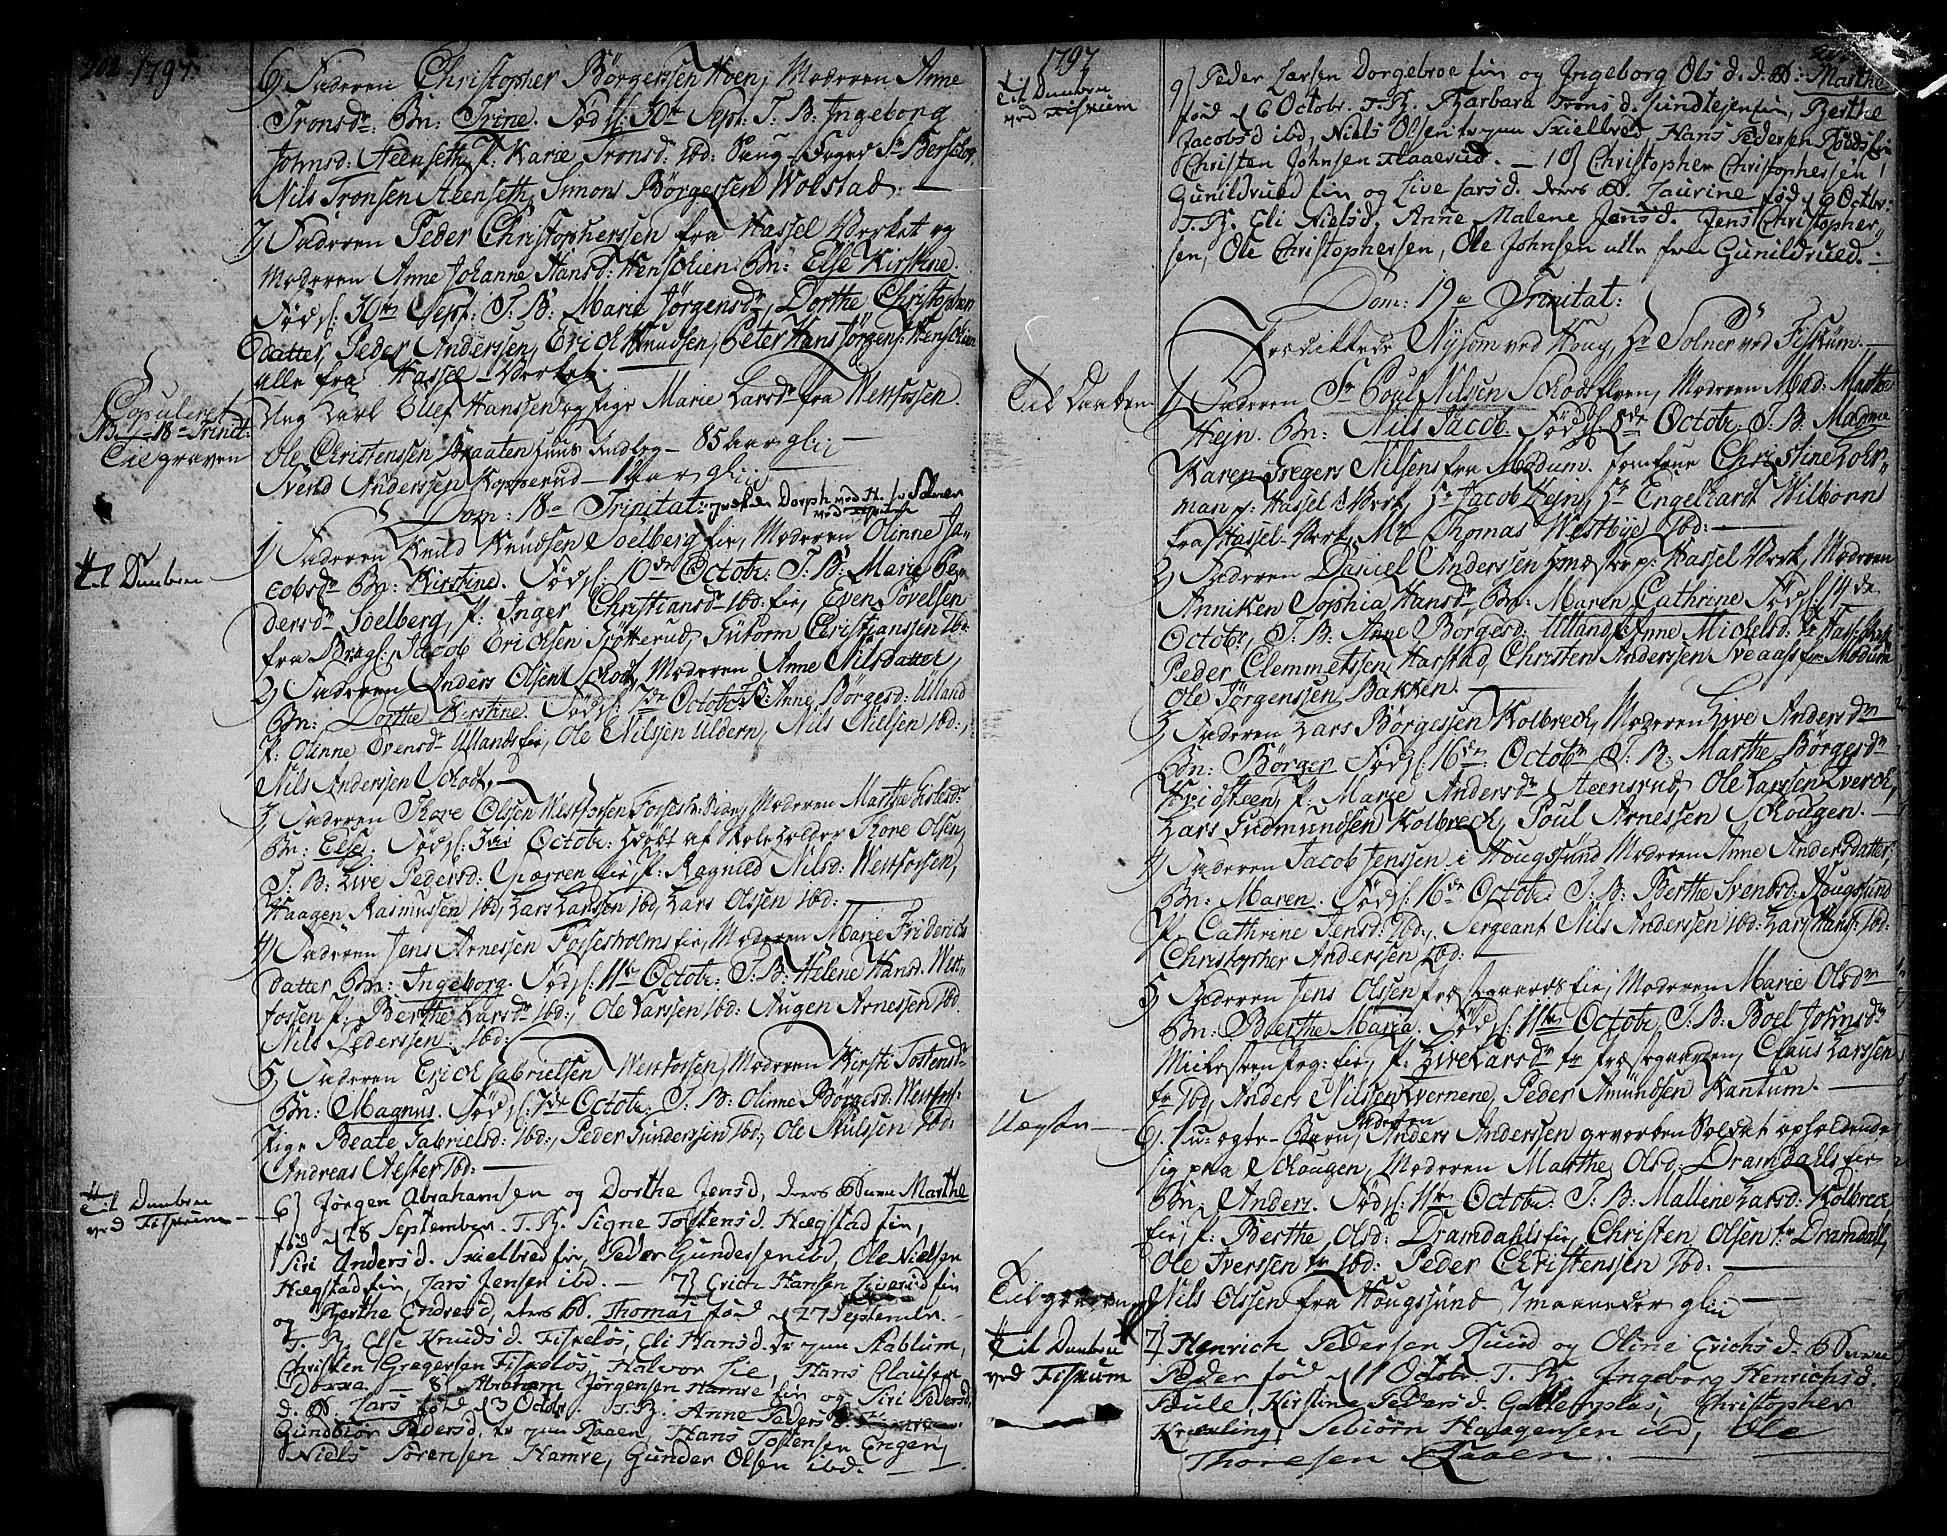 SAKO, Eiker kirkebøker, F/Fa/L0009: Ministerialbok nr. I 9, 1789-1806, s. 202-203